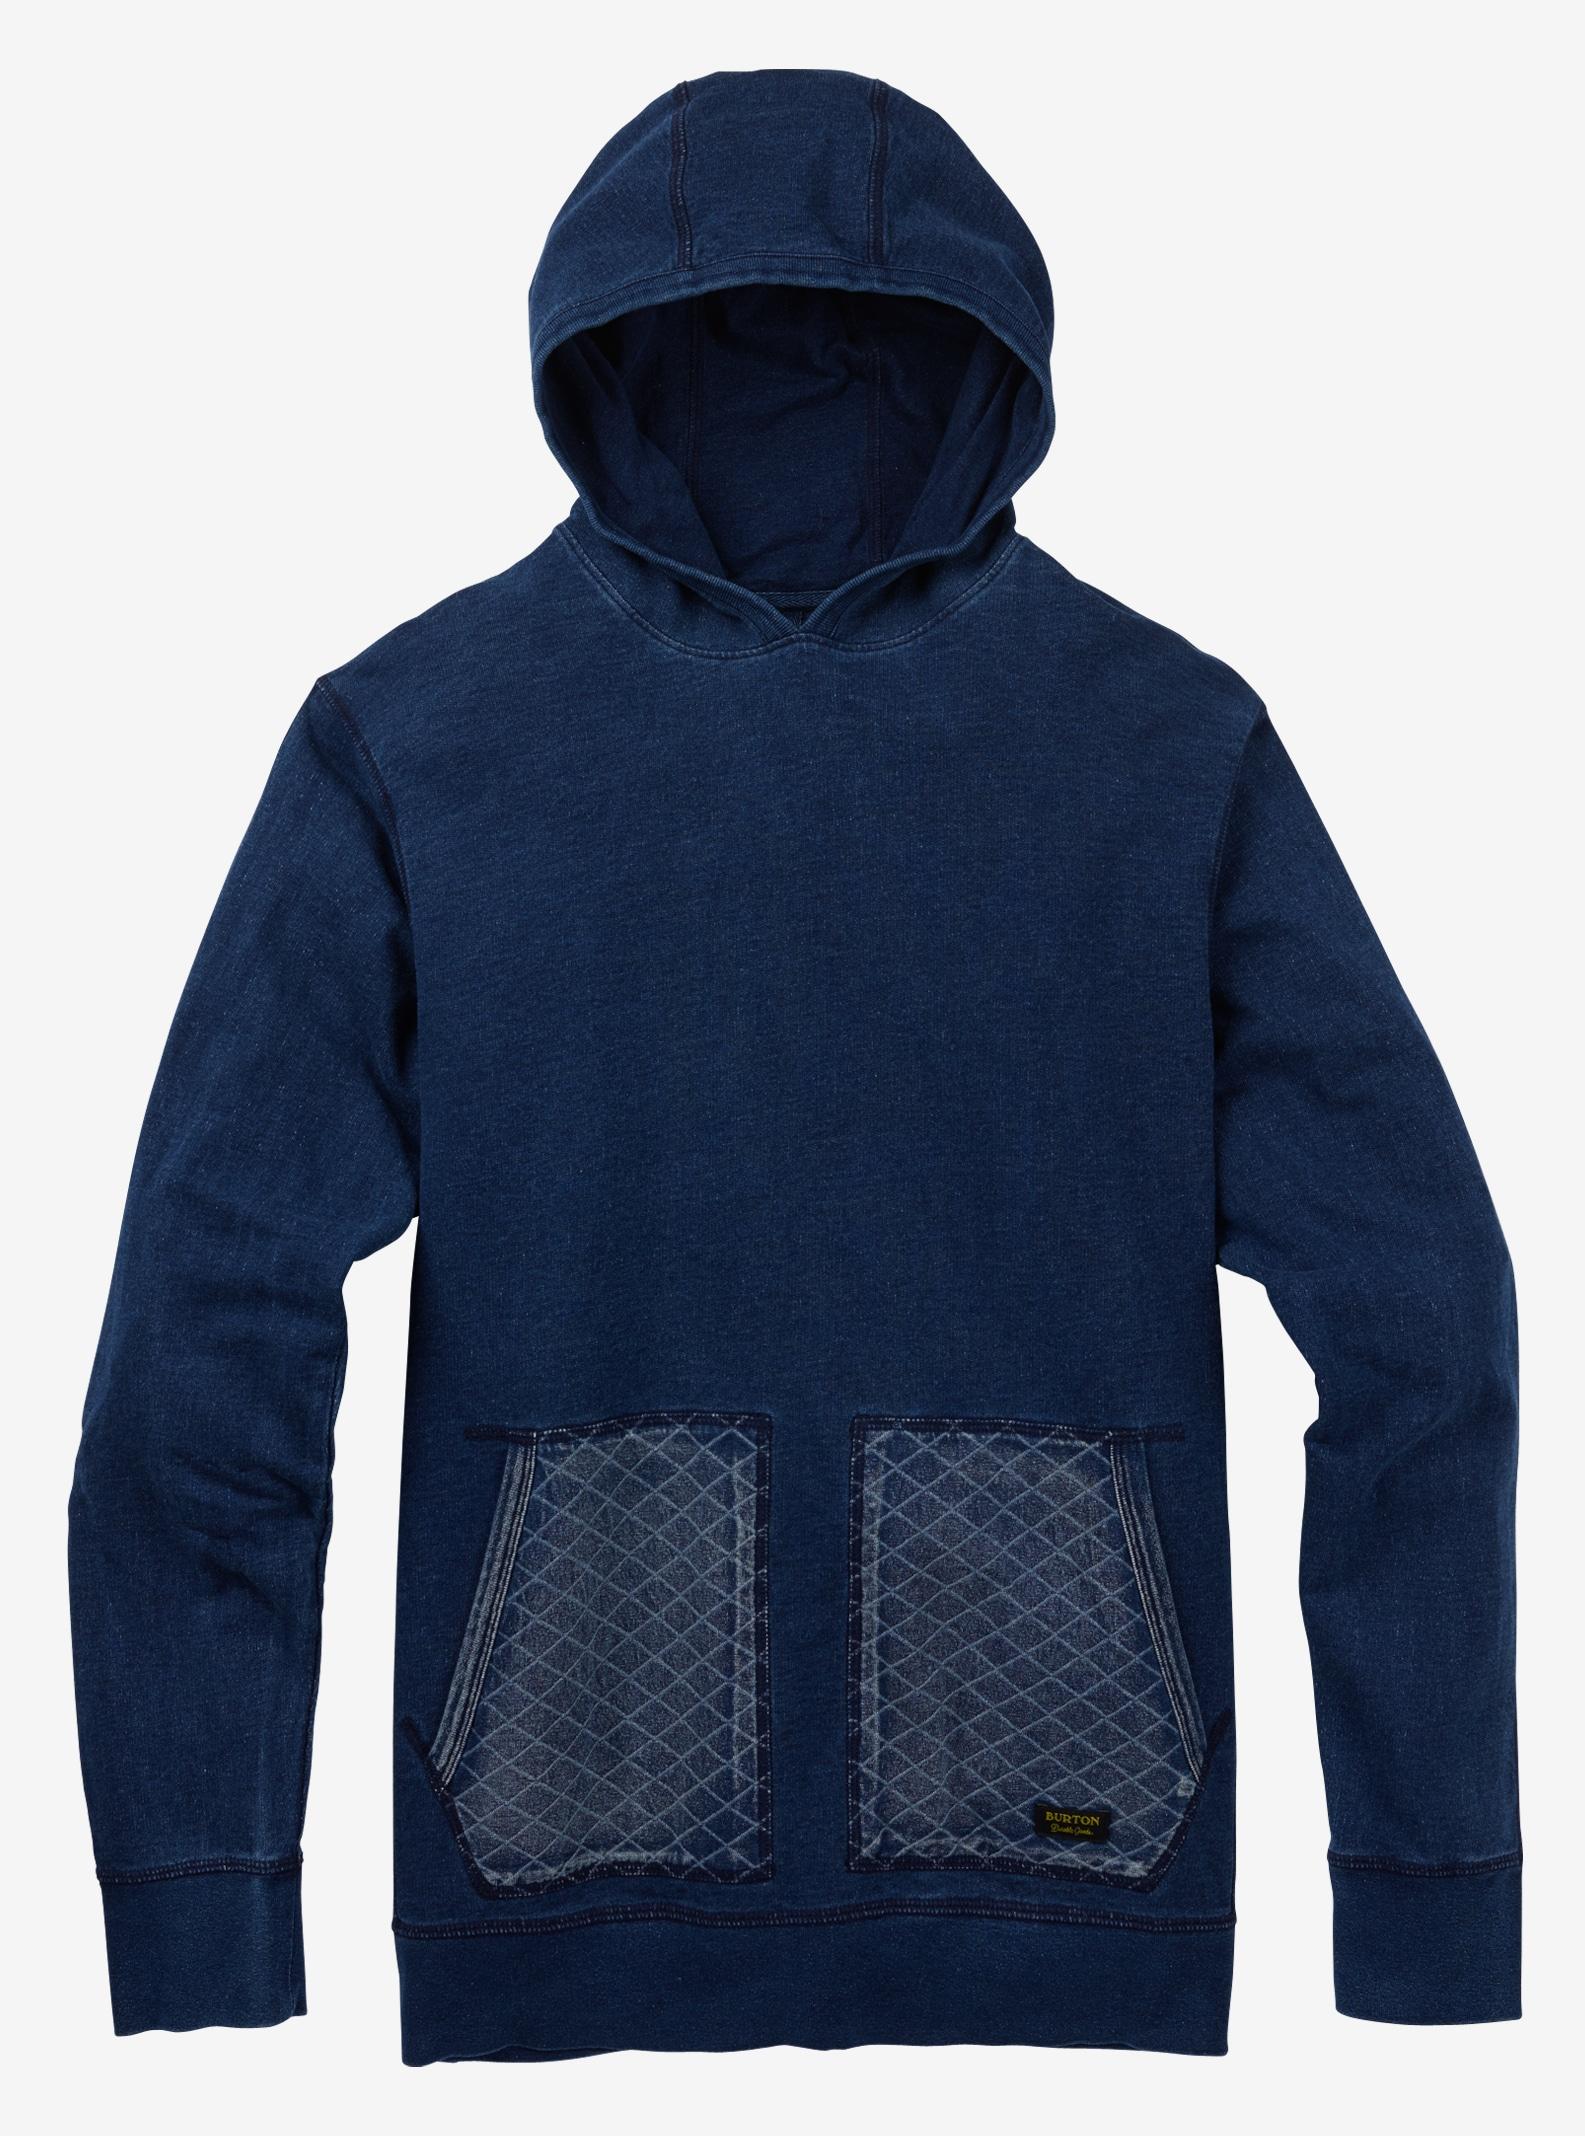 Burton Monhegan Fleece Pullover shown in Indigo